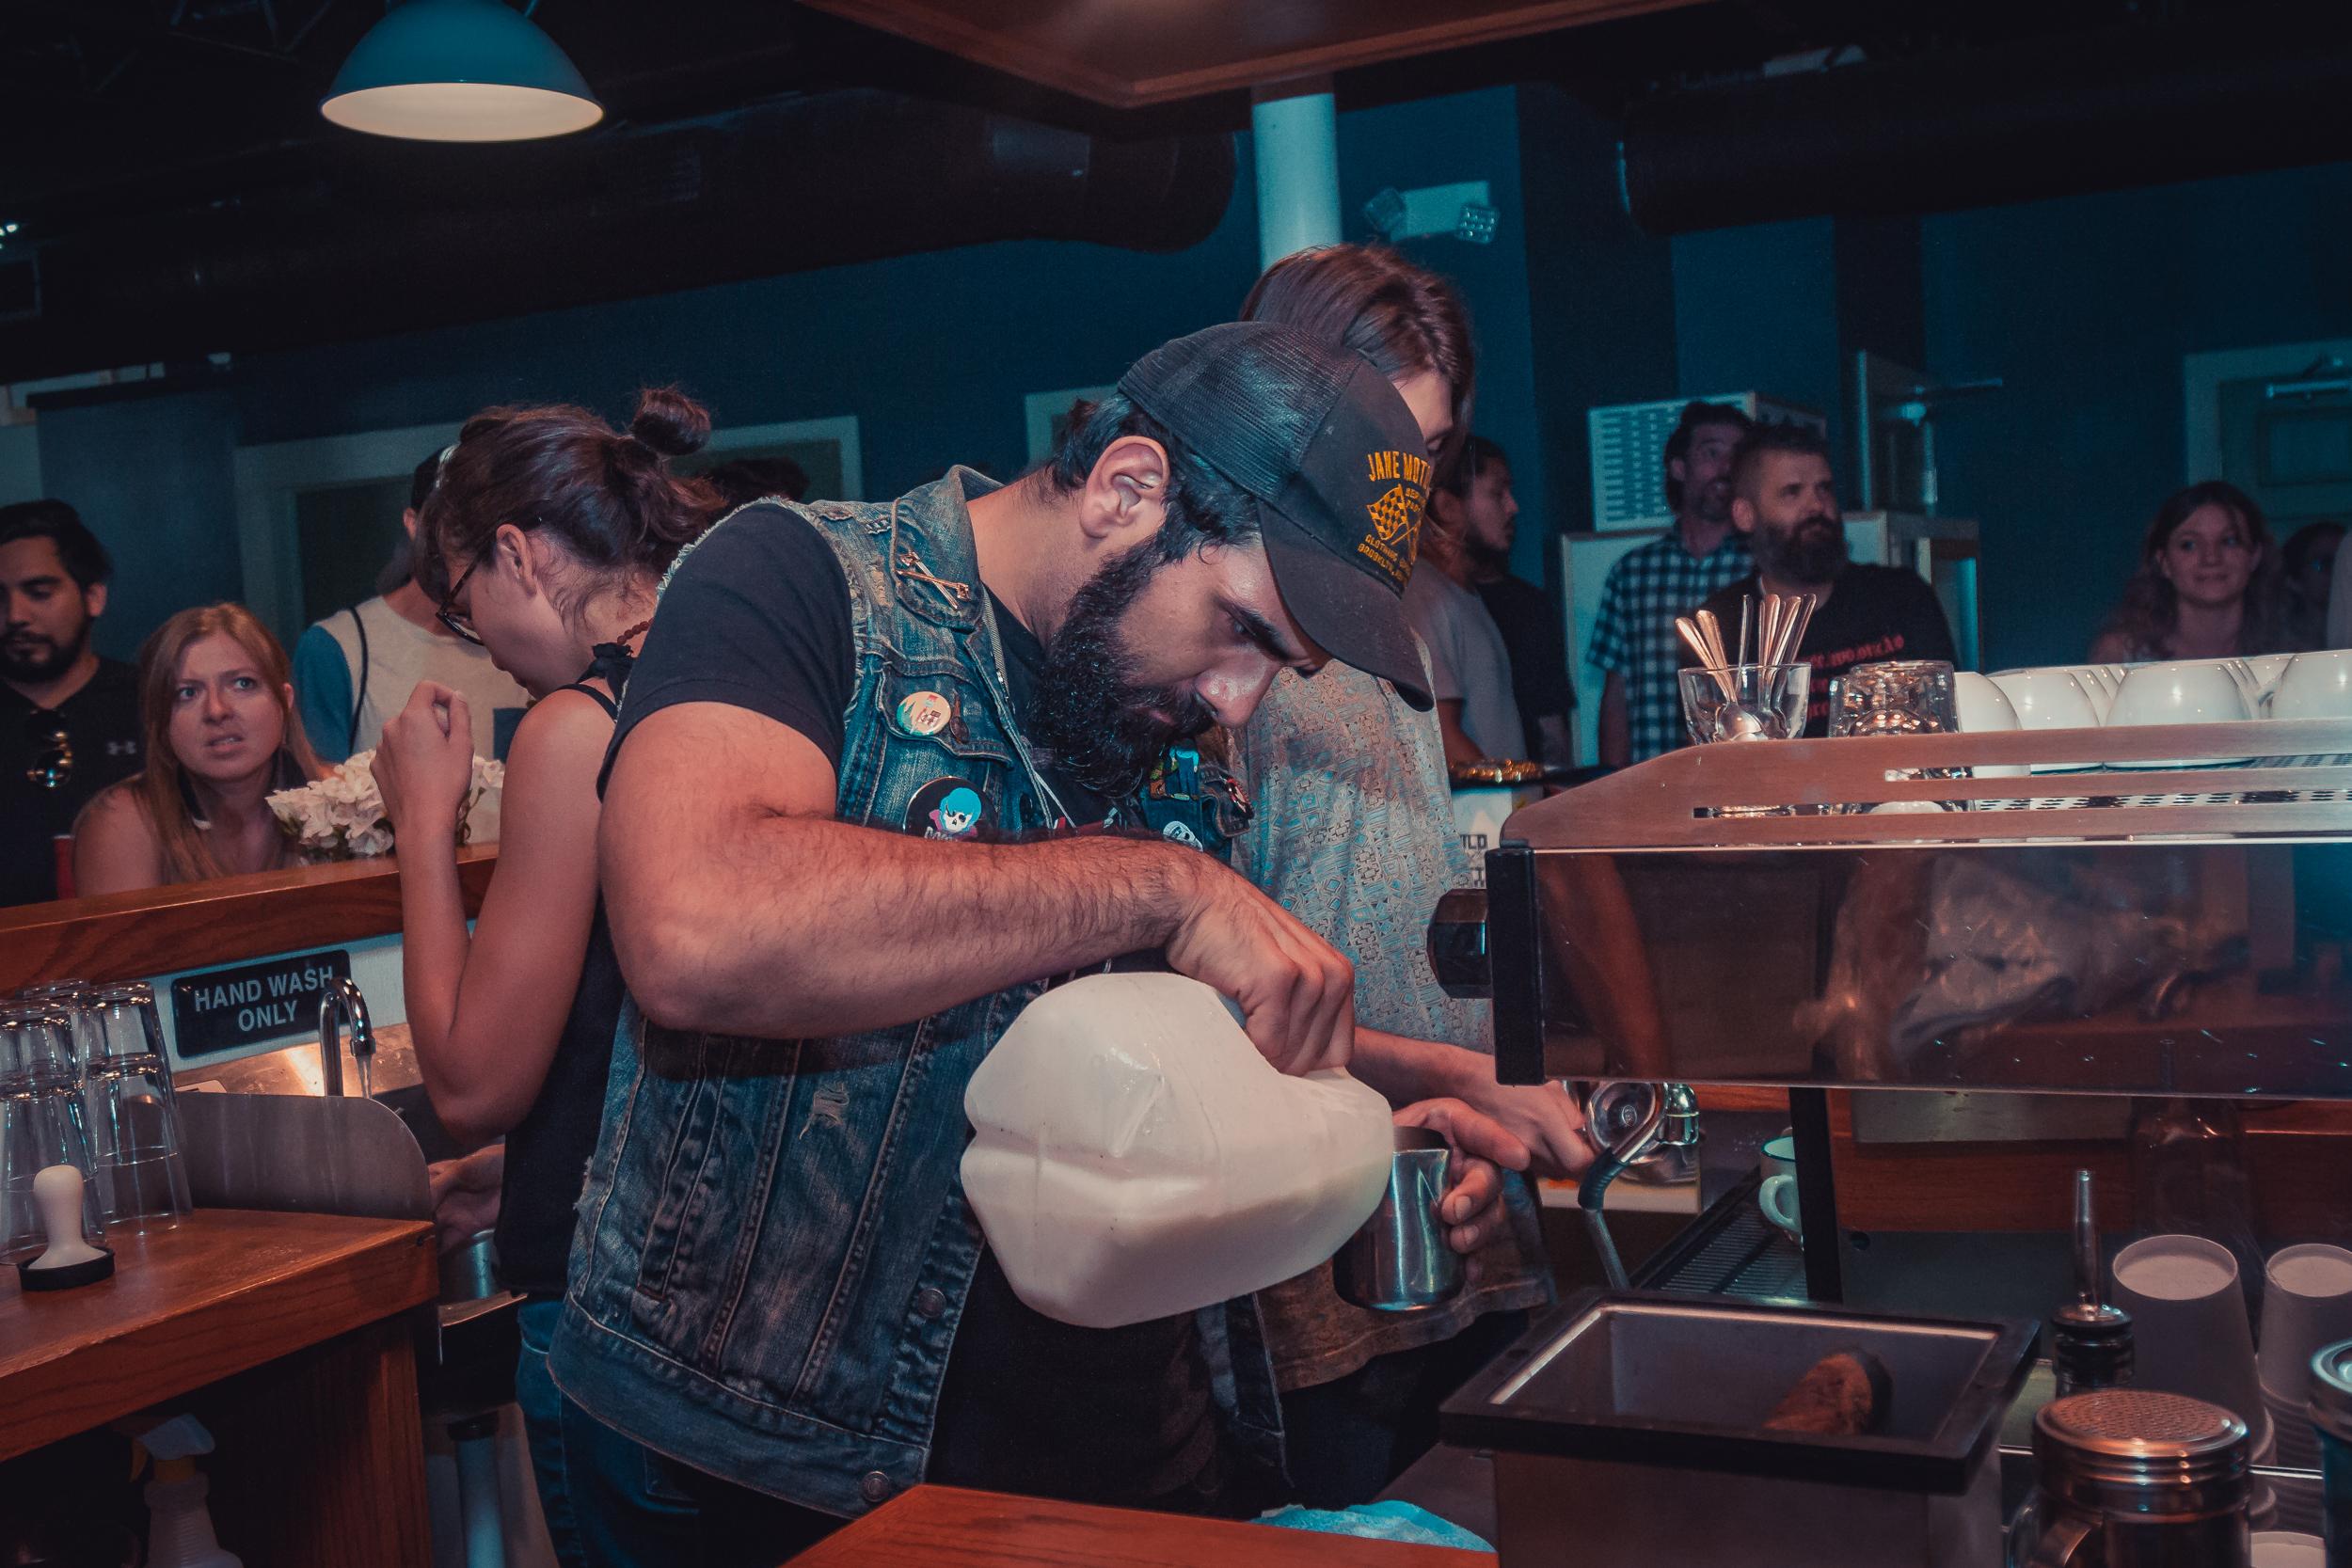 Barrets roasters, Austin TXJuly 28th, 2017 - Latte art throwdown